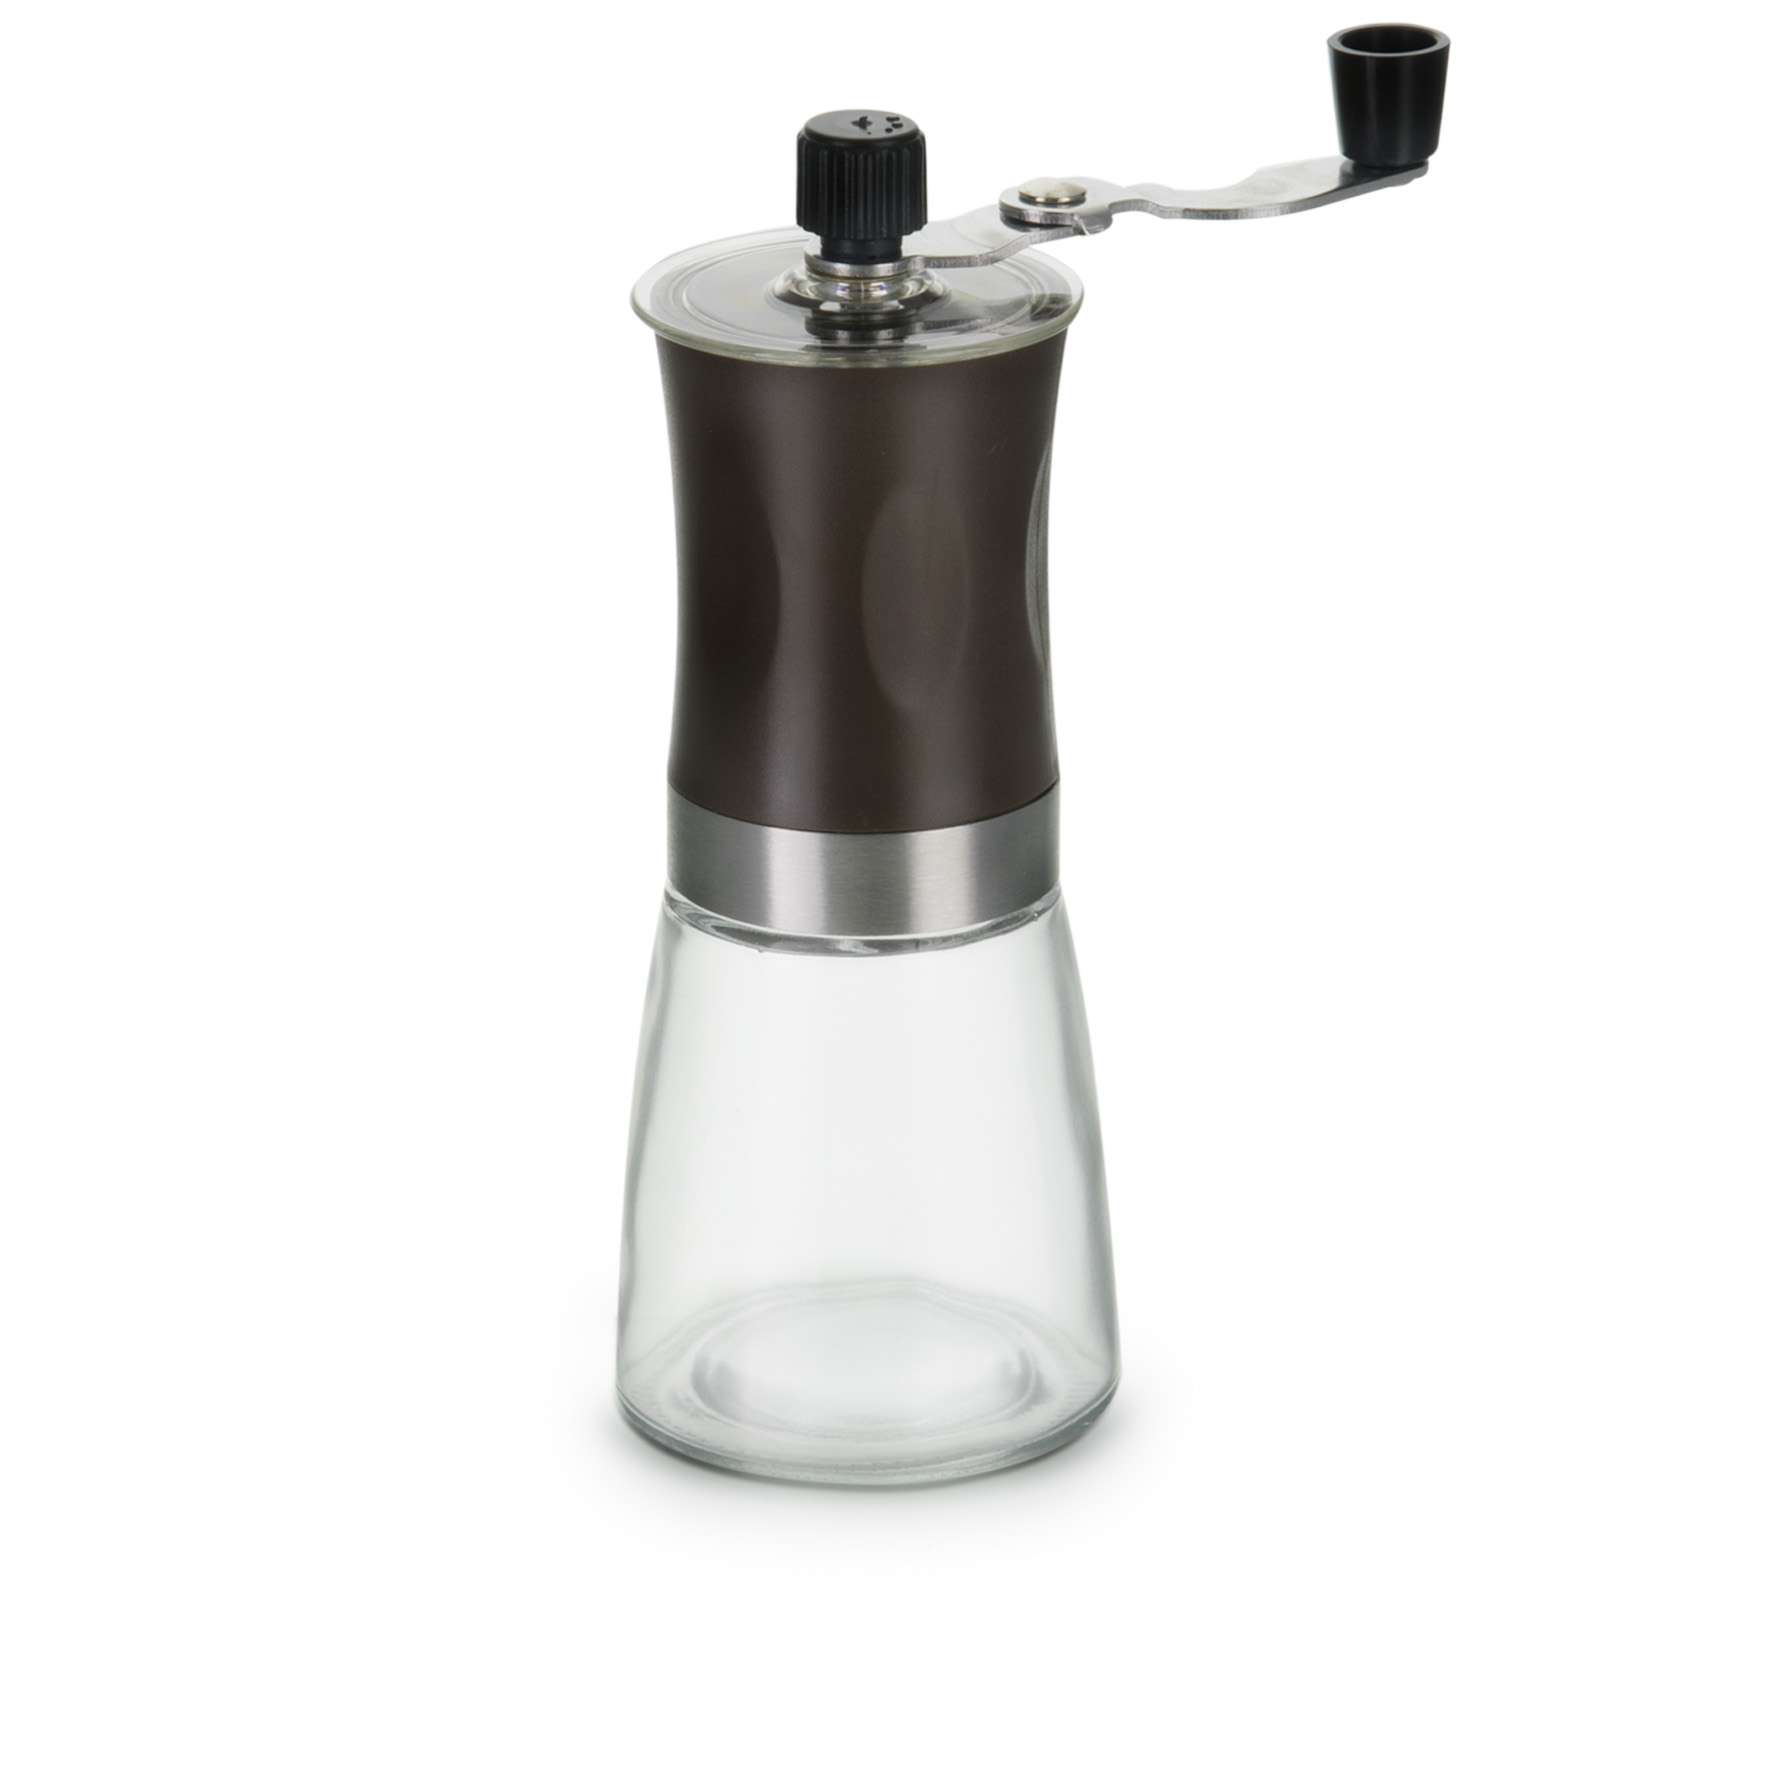 MOEDOR CAFÉ MANUAL VIDRO INOX - 7261 - AF20218